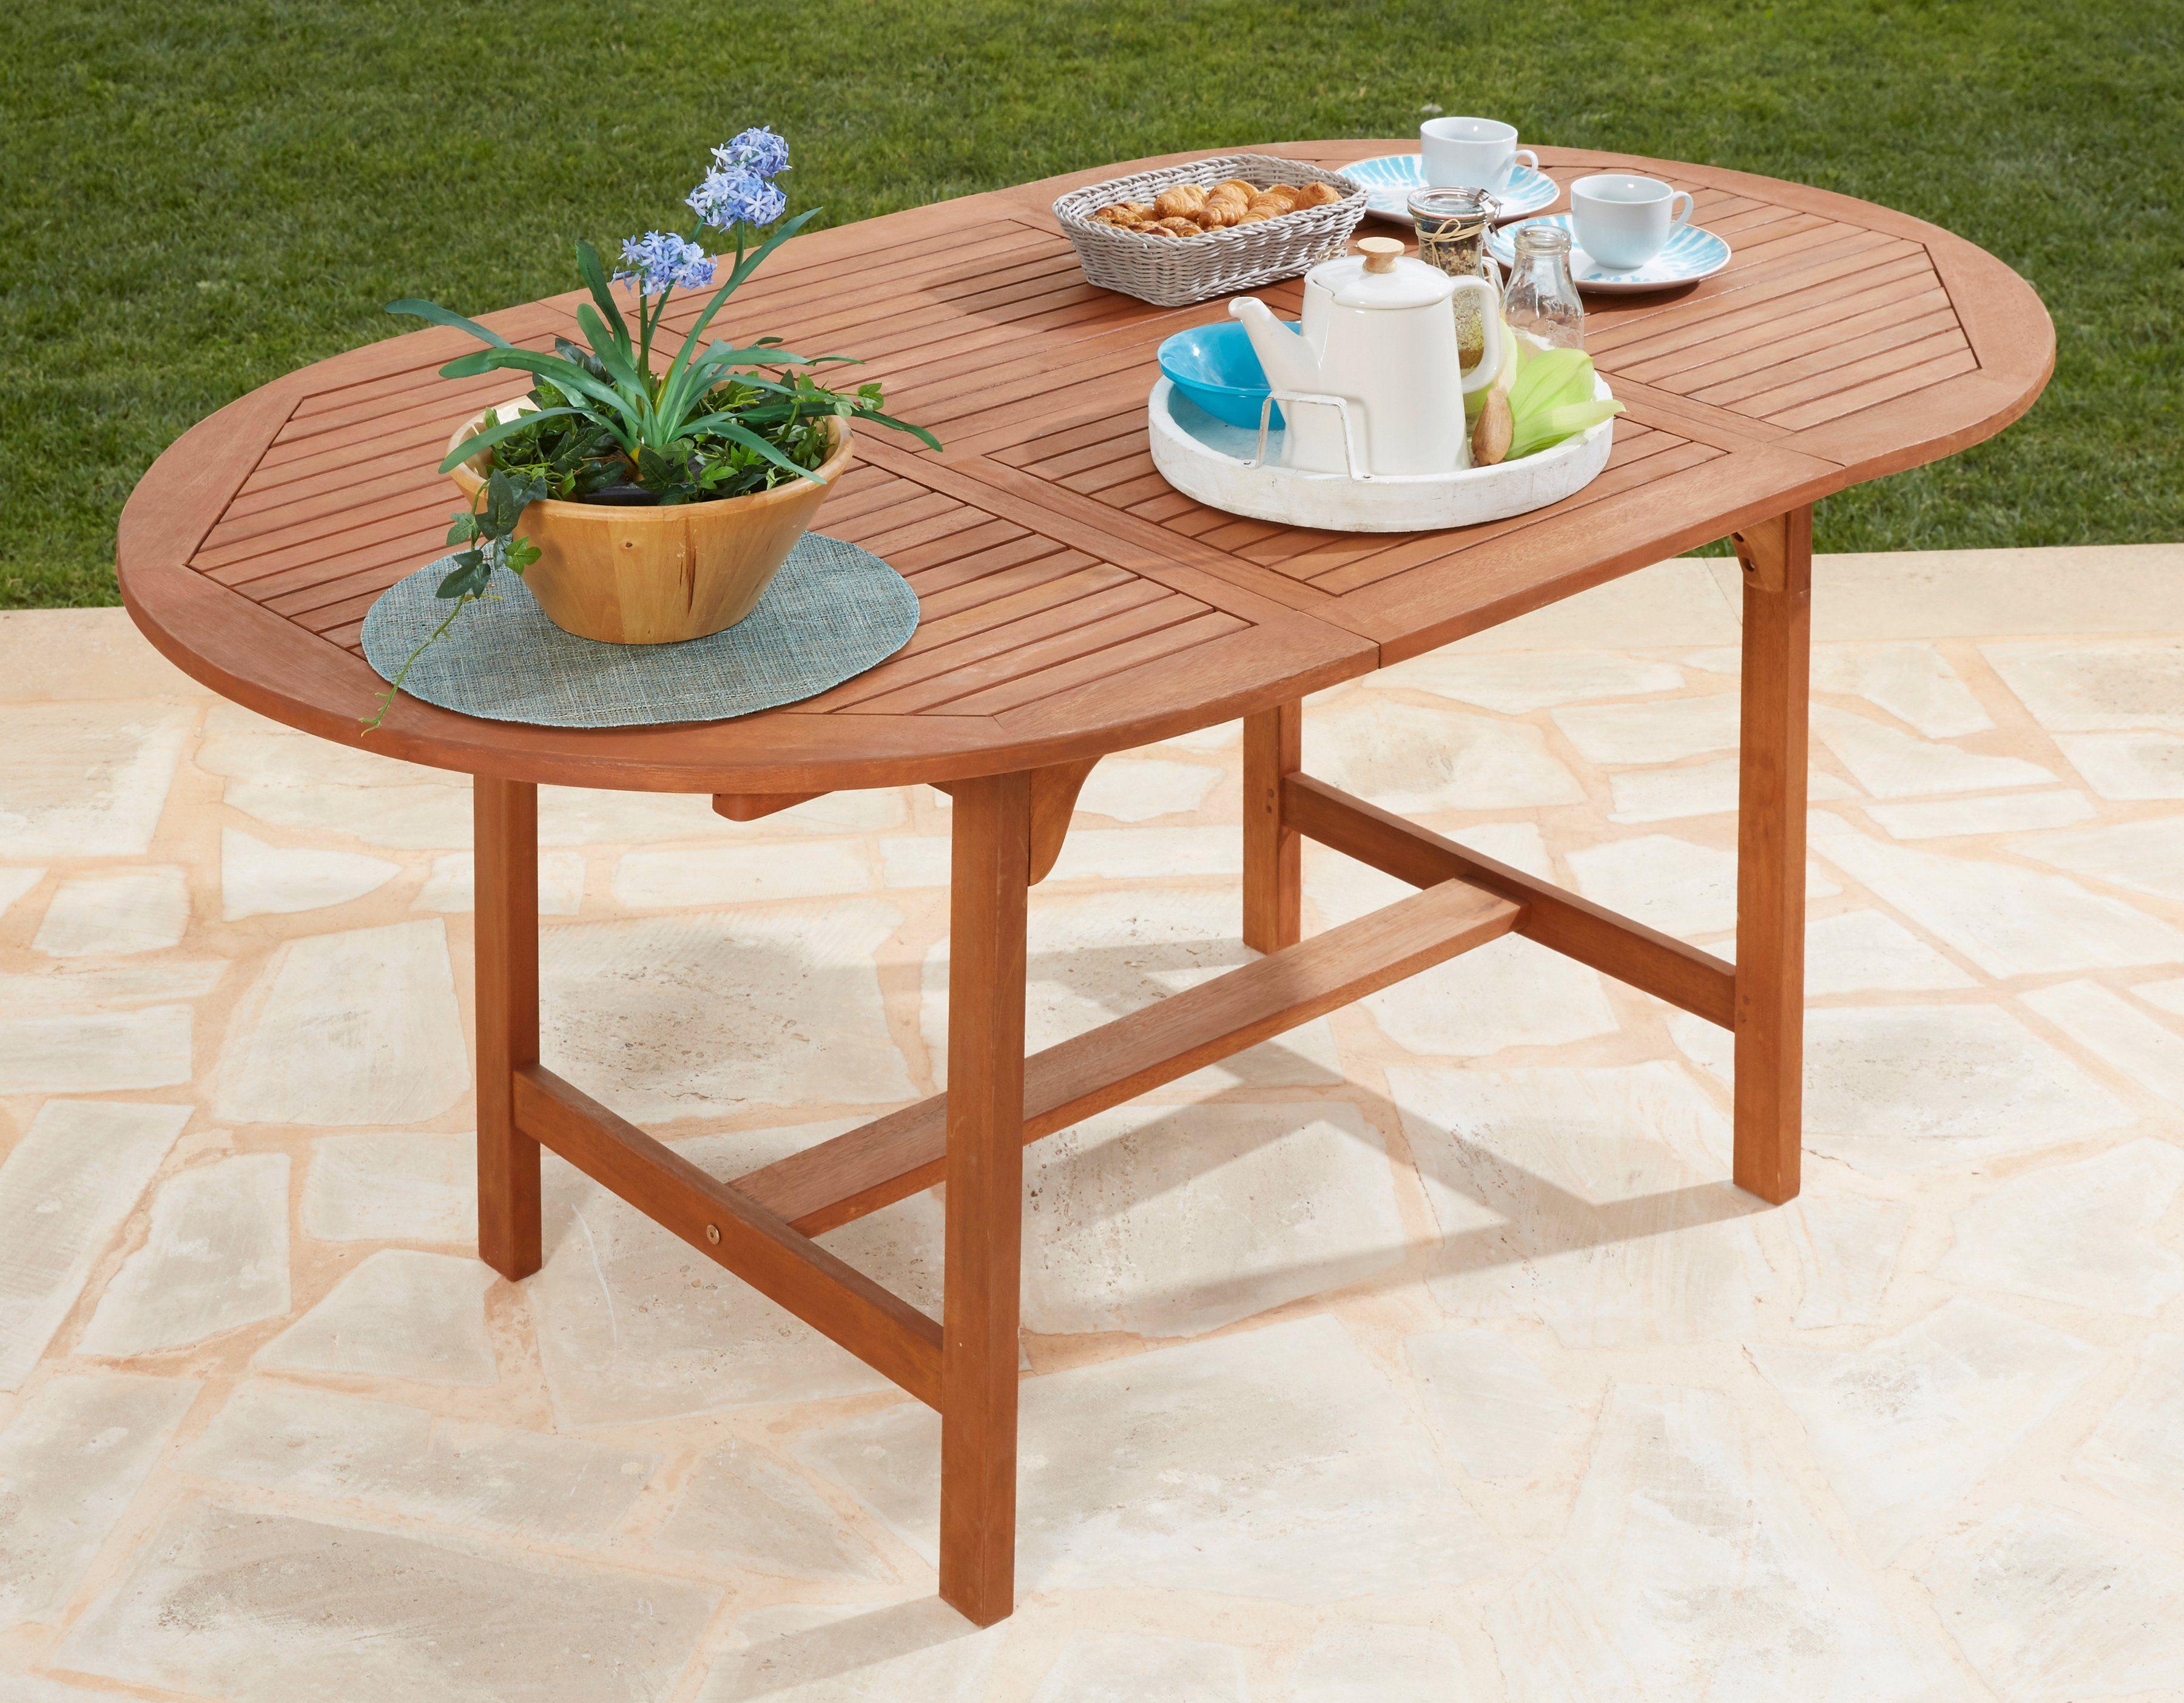 Gartentisch »Maracaibo«, ausziehbar, Eukalyptusholz, 120-170x100 cm